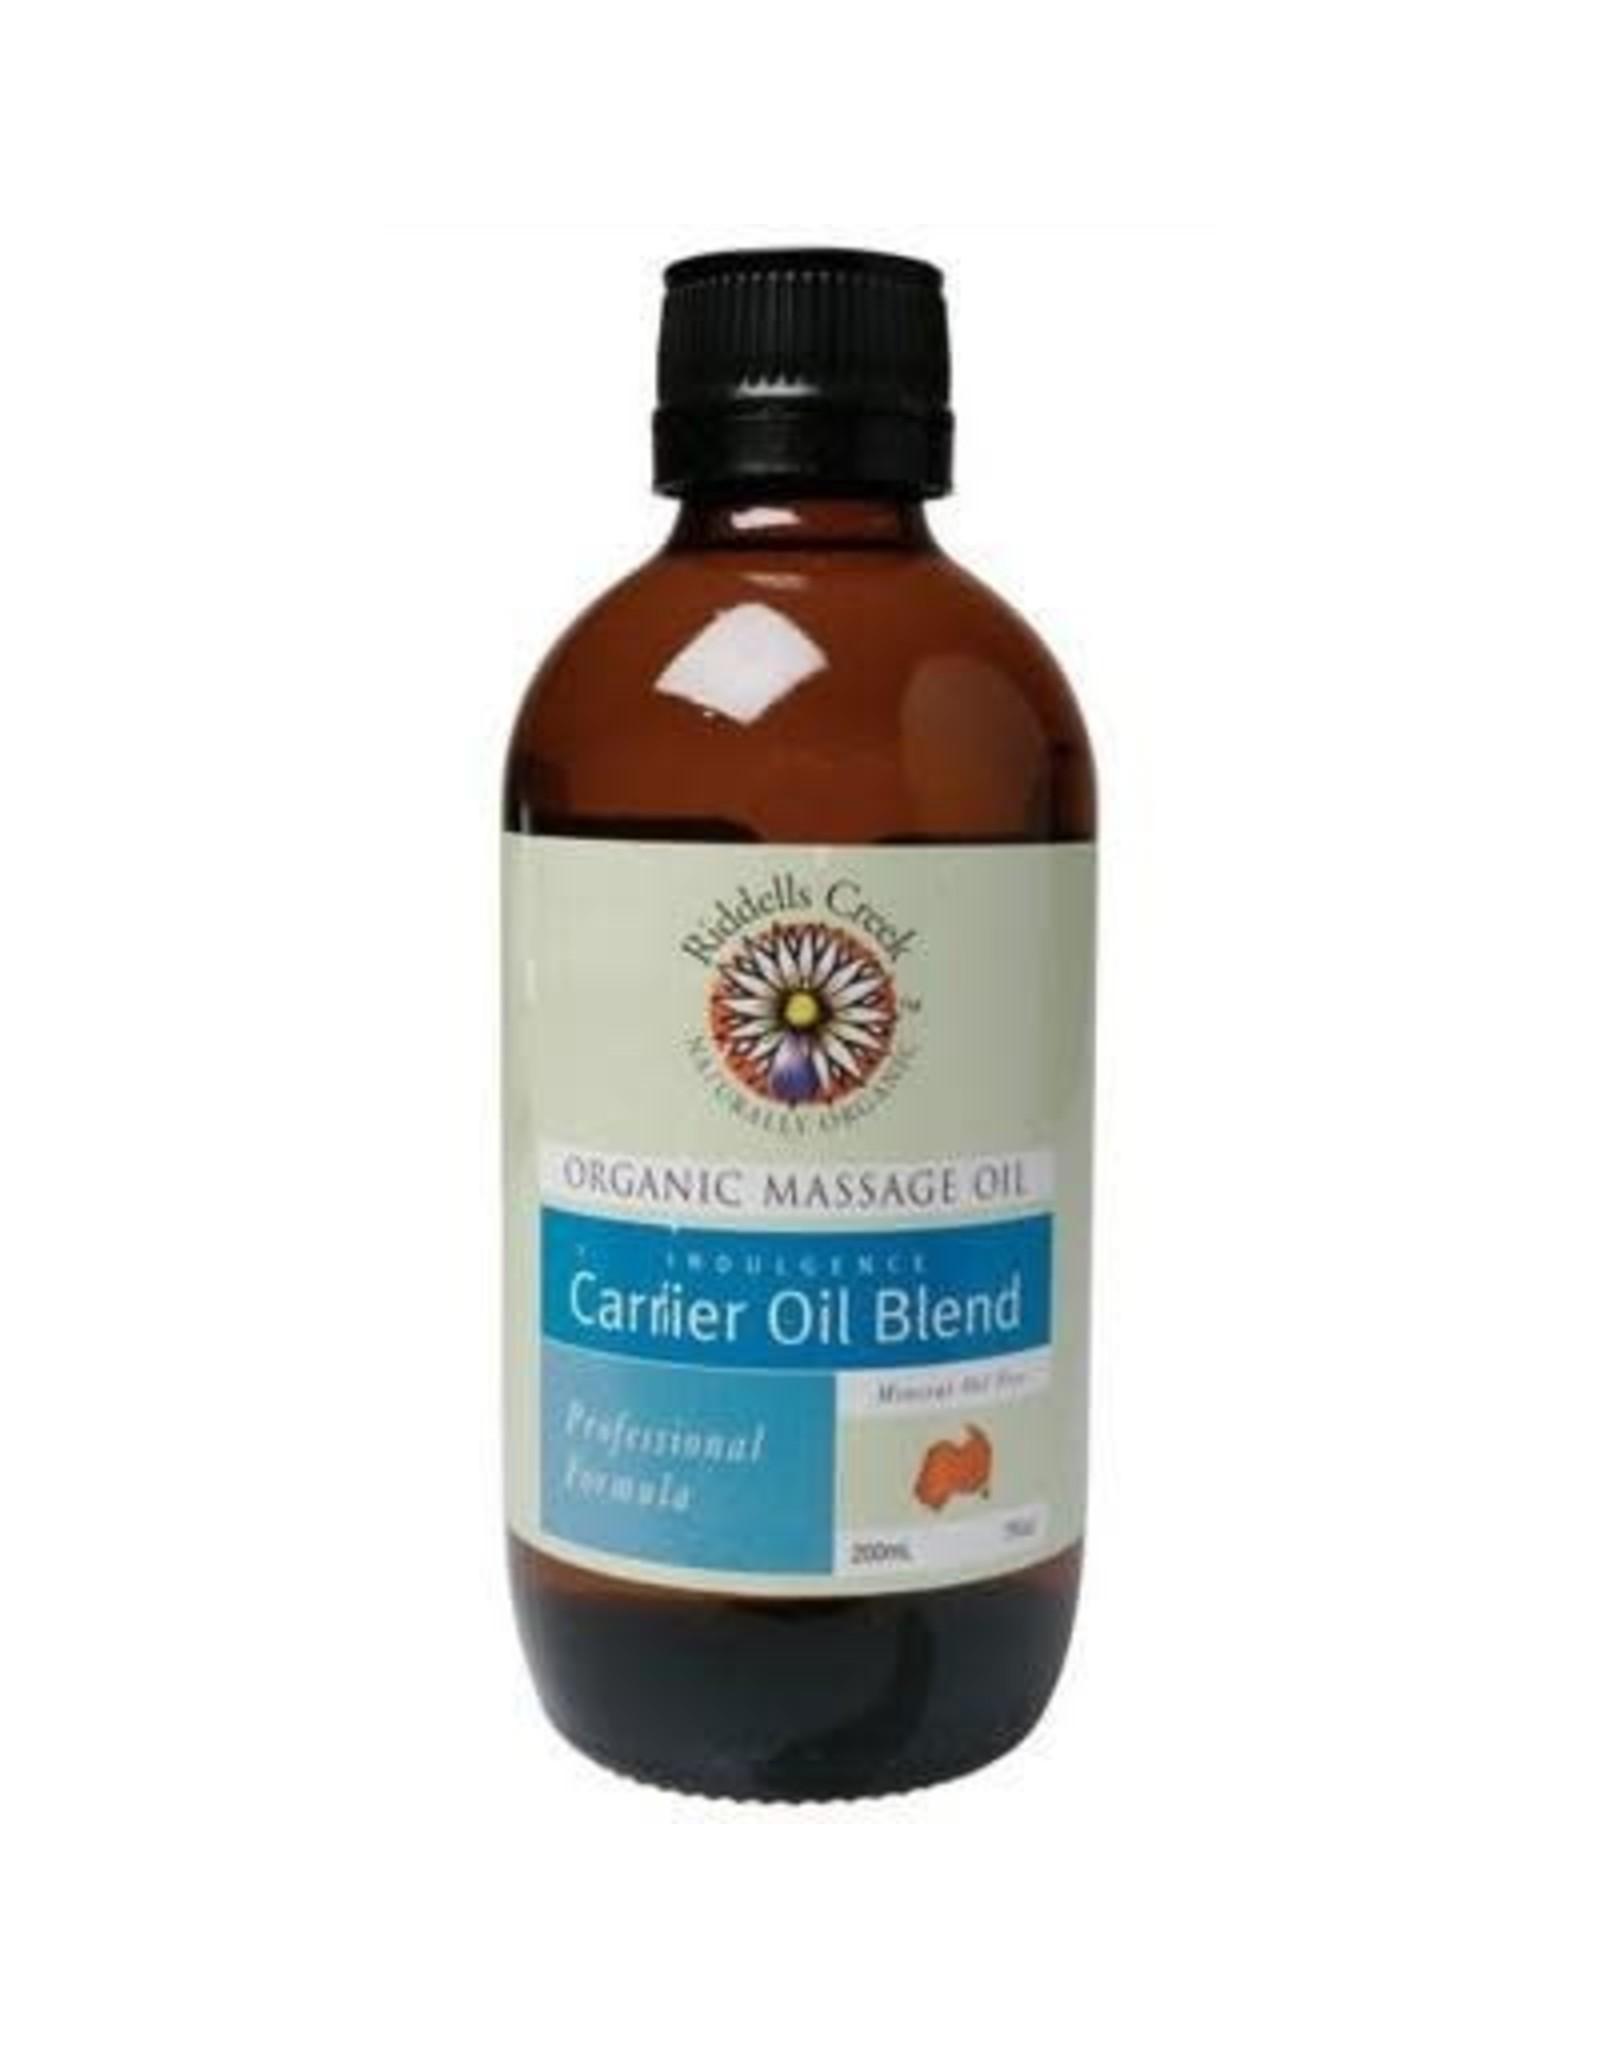 Riddells Creek Massage Oil Carrier Oil Blend 200ML